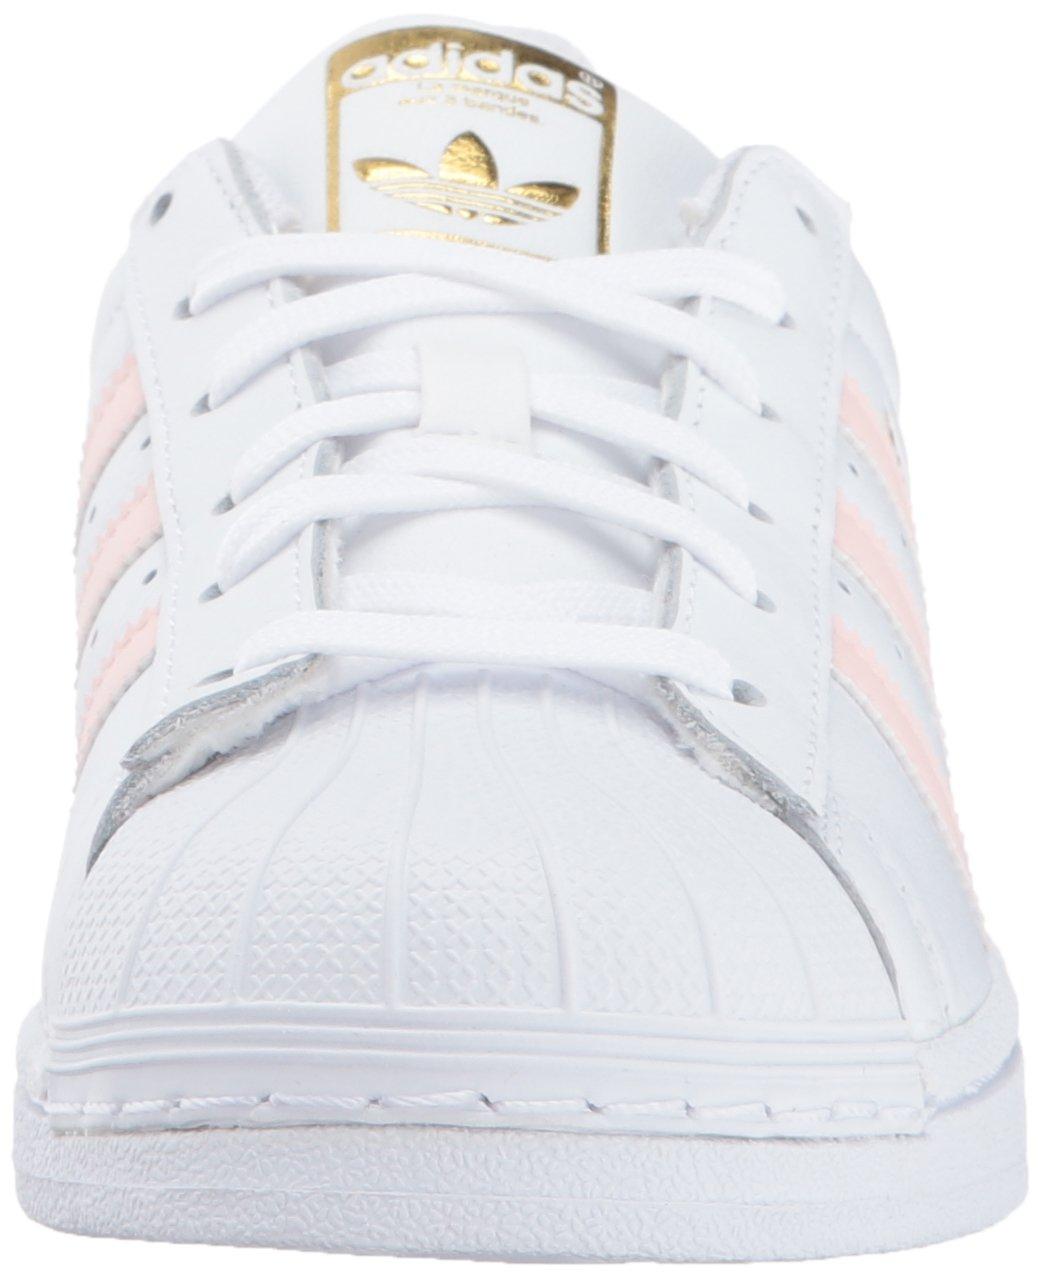 Adidas Originali 8496 Mujer) Superstar B073vs8thh Blanco / Hielo